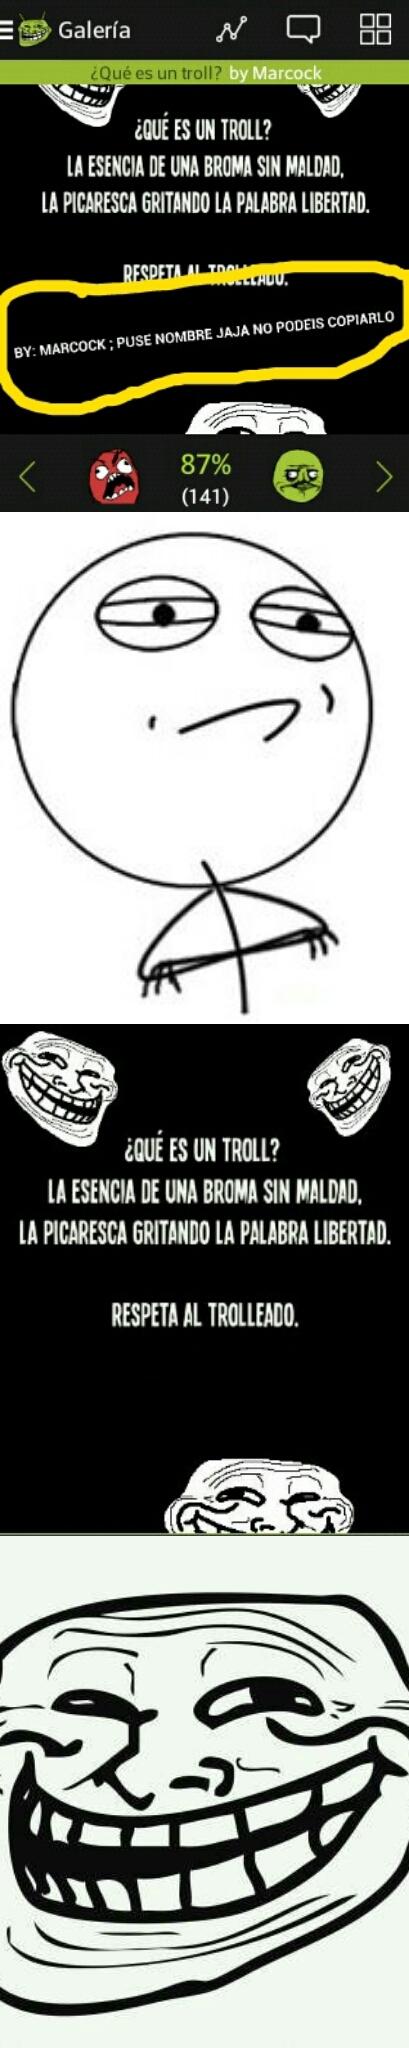 troll trolled - meme